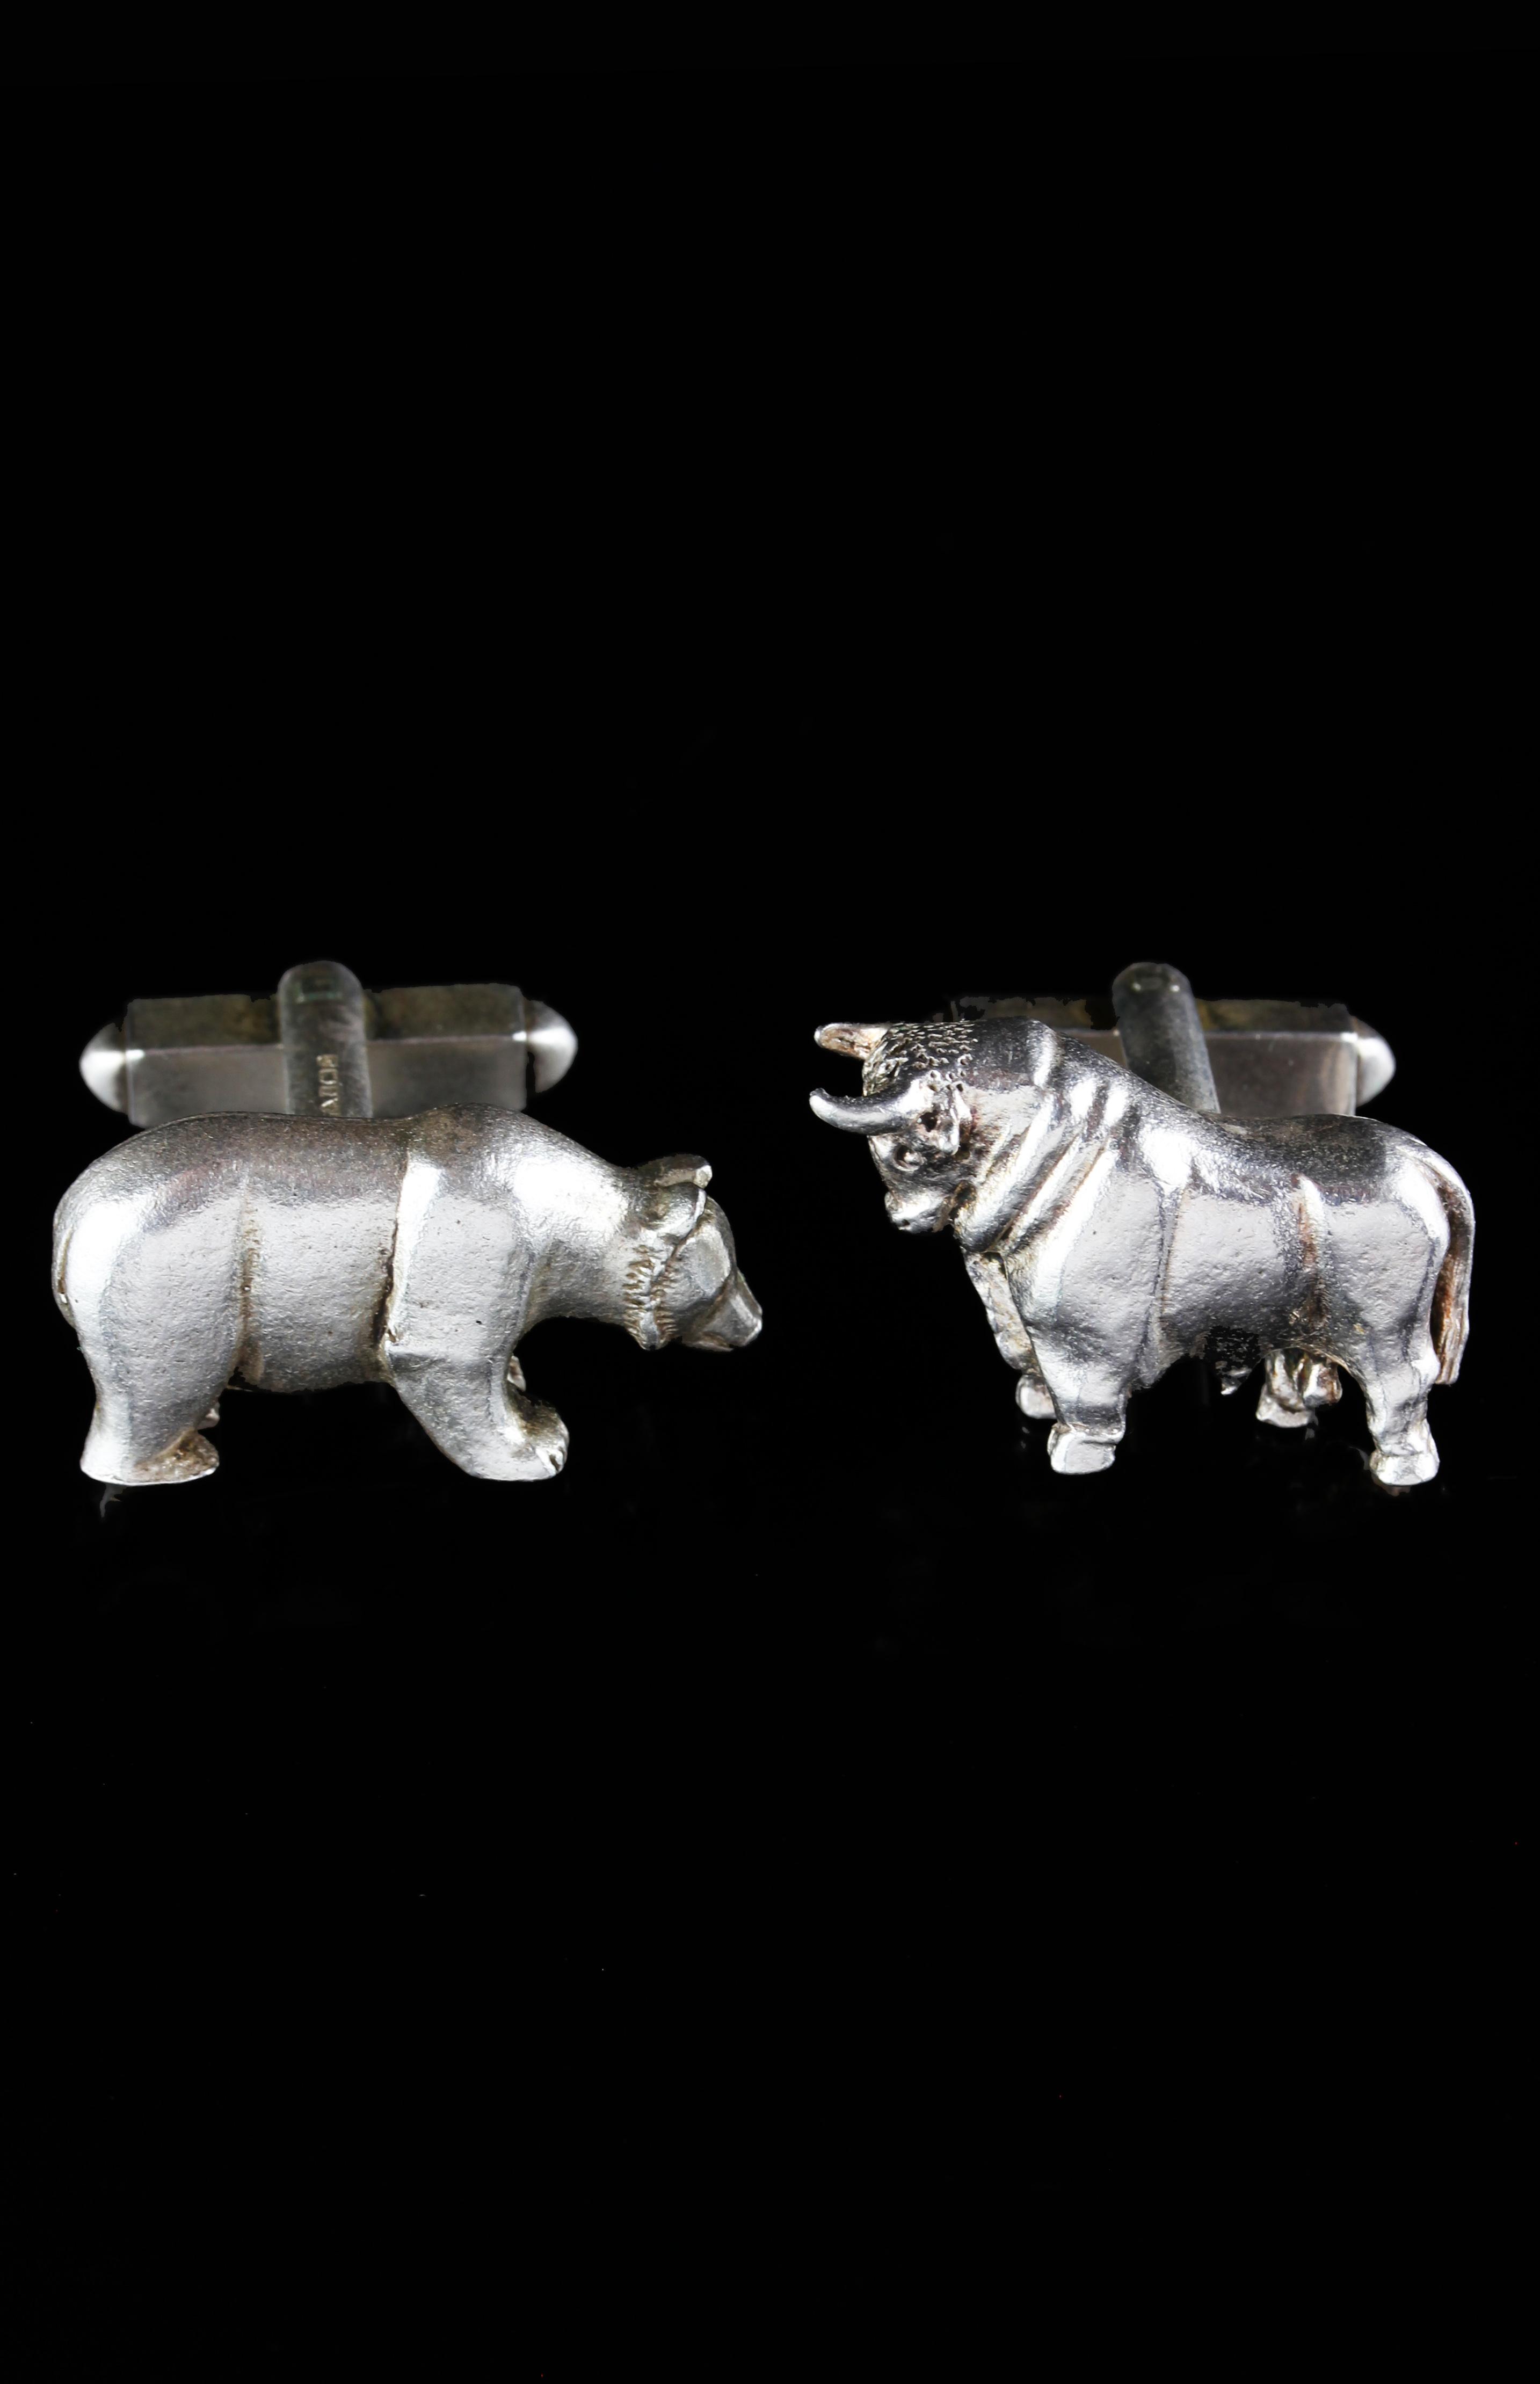 Pair of silver cufflinks with bull & bear